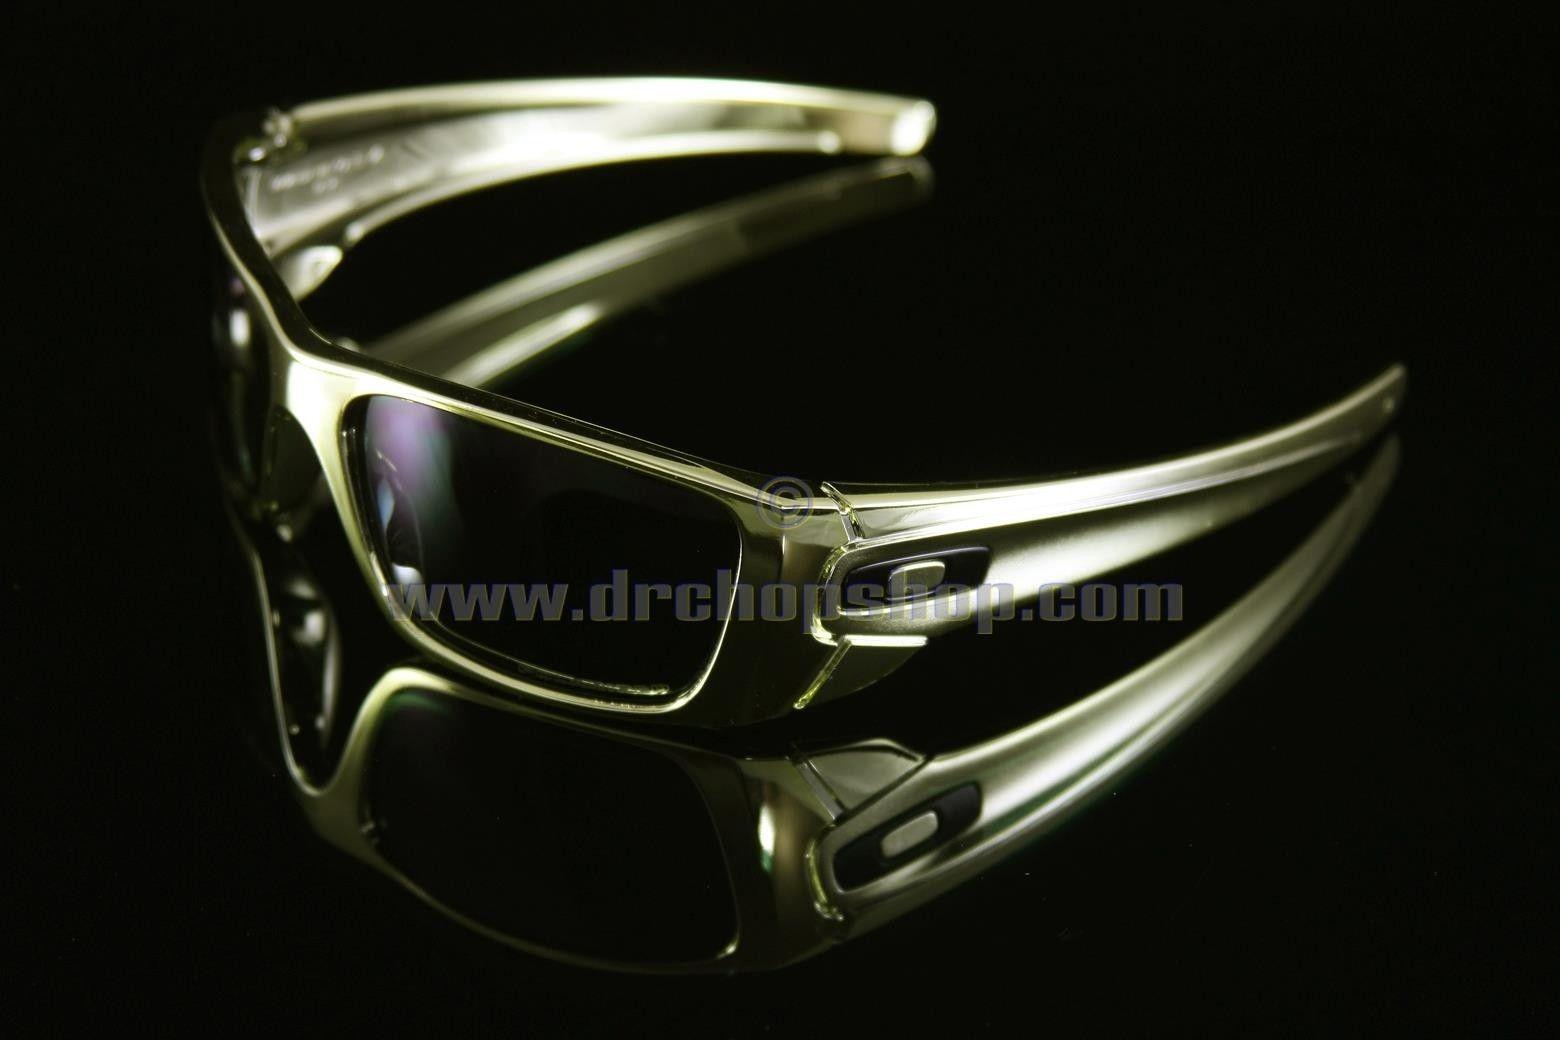 A Few Customs For Sale - 478571_601833216495035_470035937_o.jpg